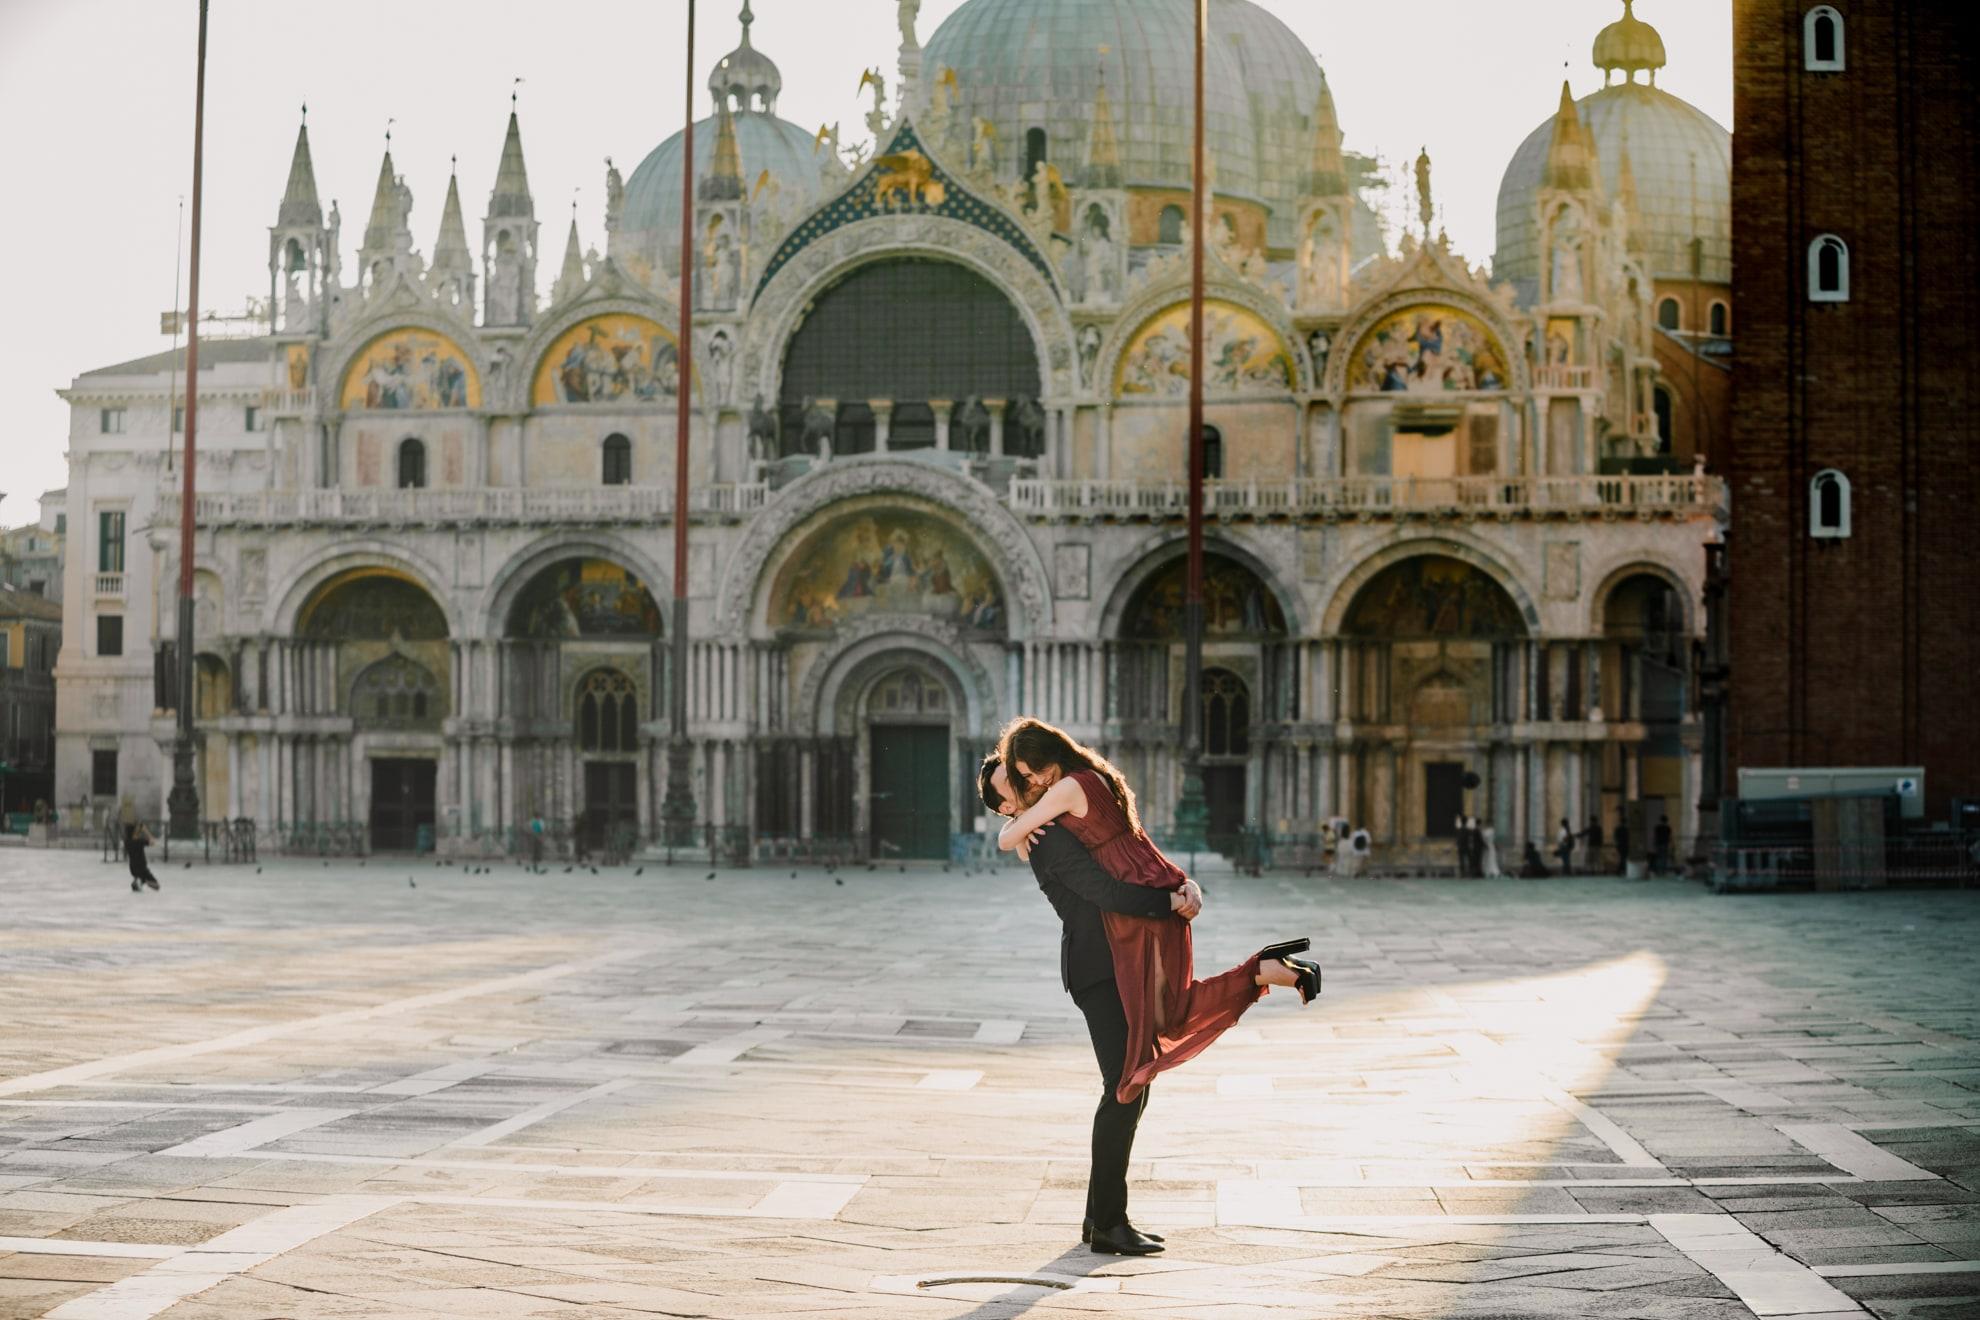 engagement venice venezia proposal proposta matrimonio fidanzamento irene pollacchi fotografa 40